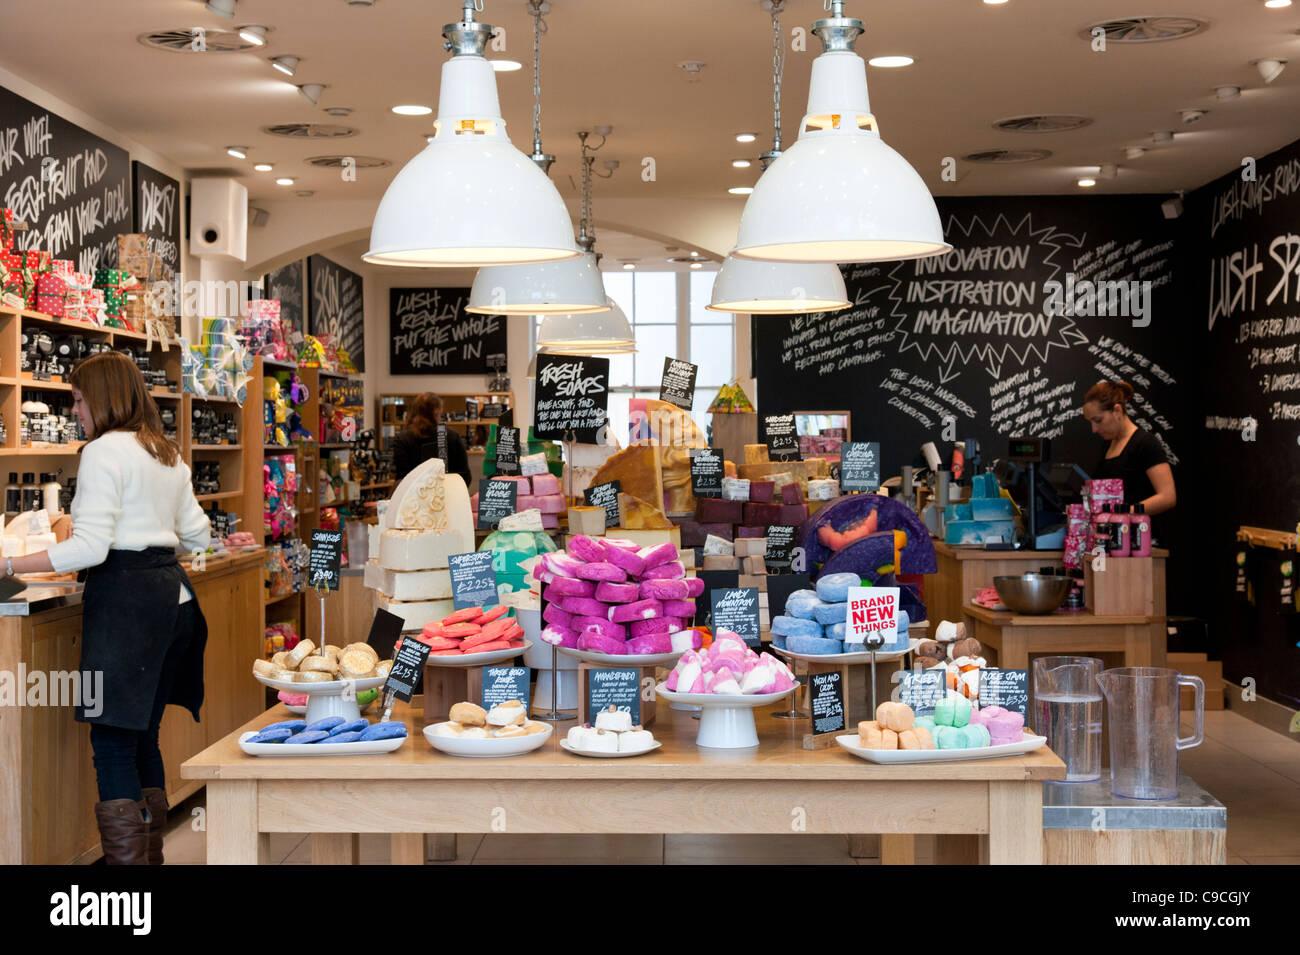 Üppige store, London, England, Großbritannien Stockbild